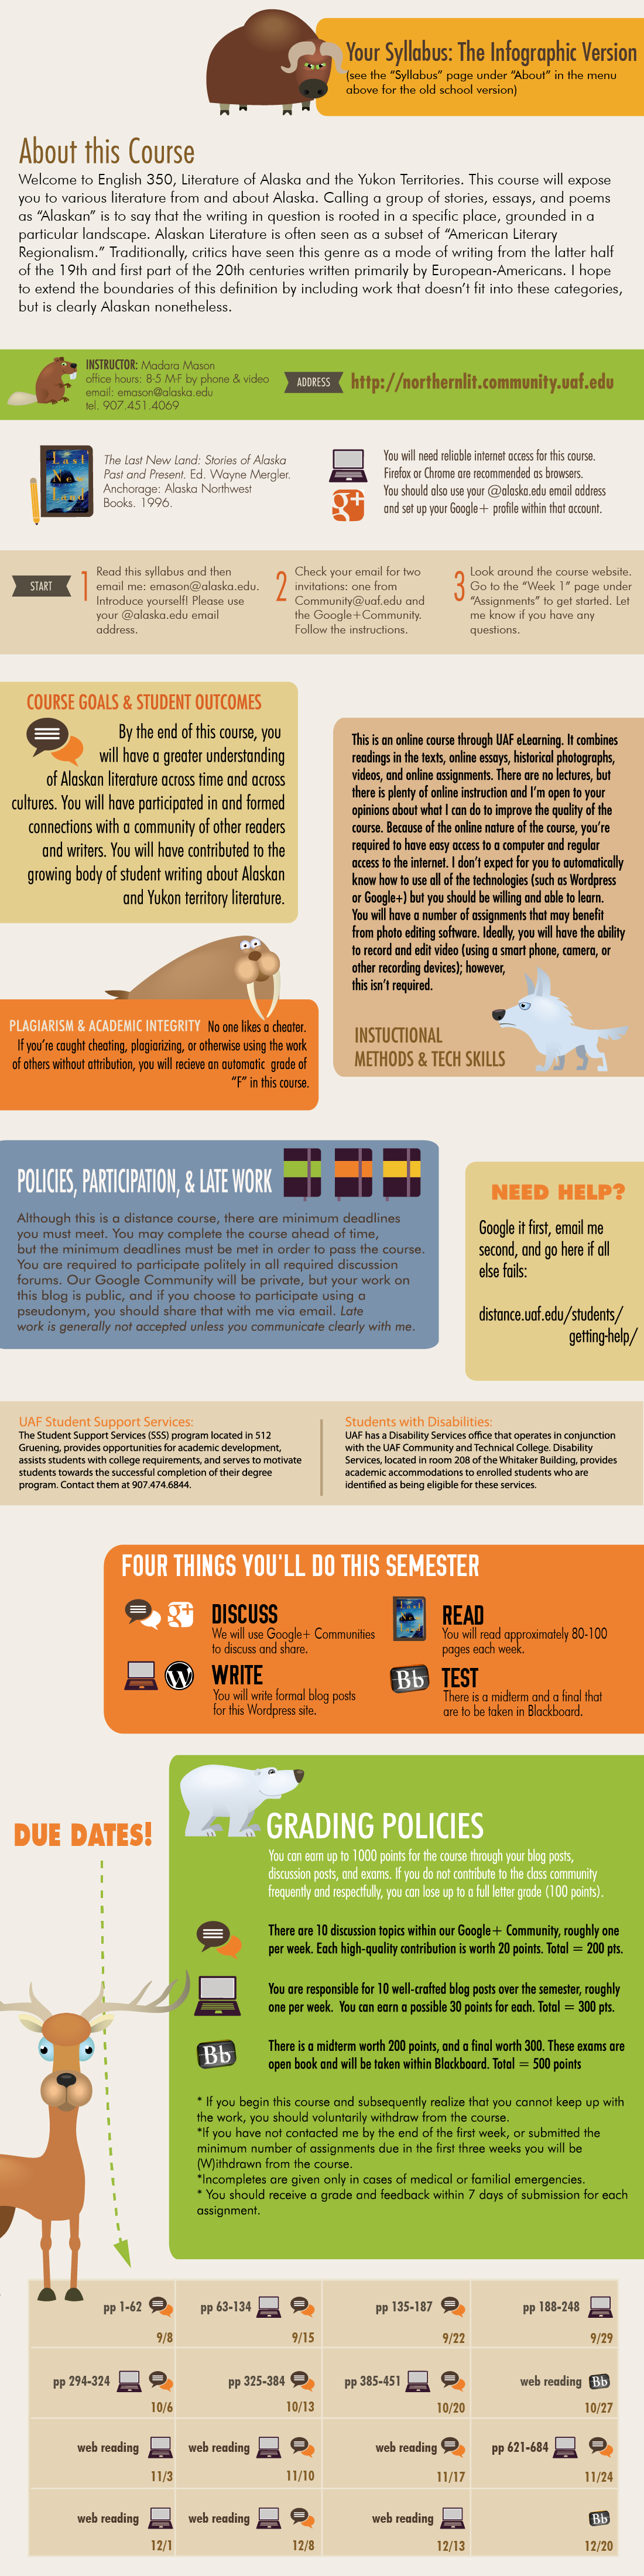 350-syllabus-infographic-2